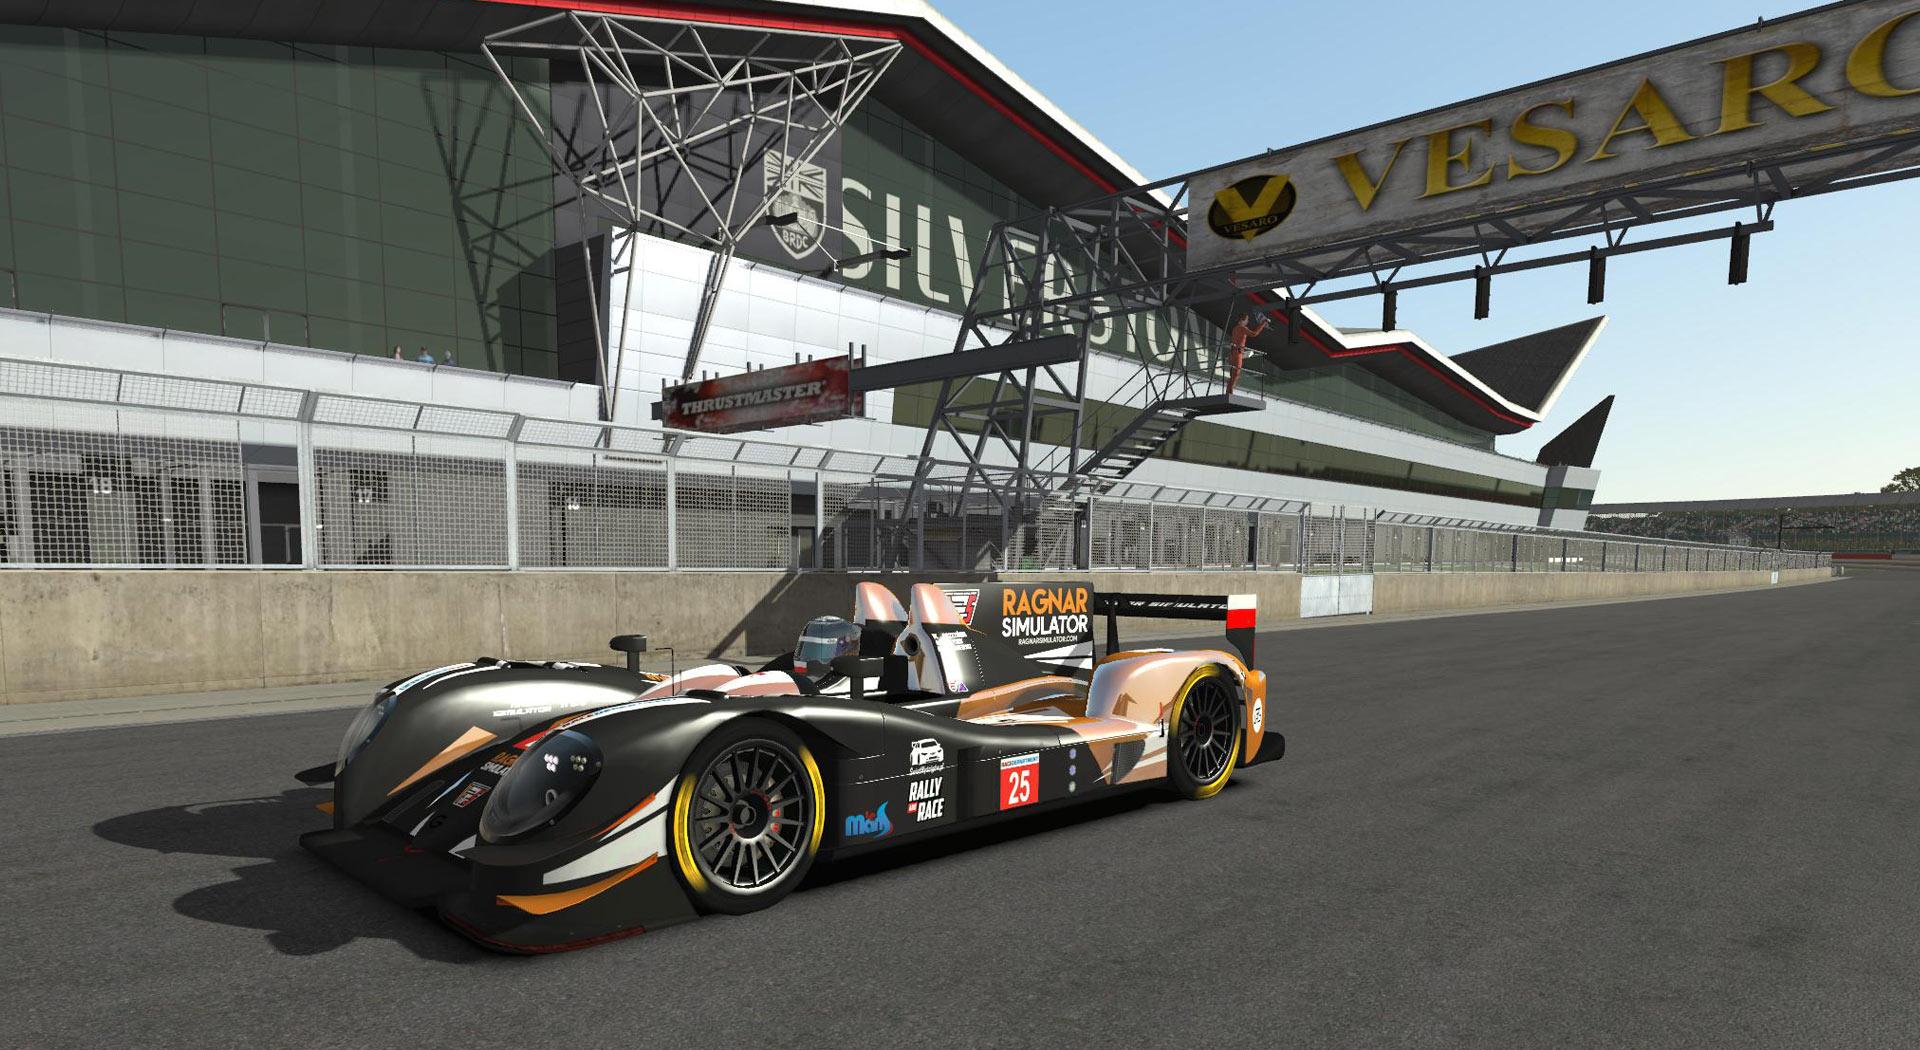 RDLMS by Vesaro - Round 2 Silverstone - FEEDER Ragnar Simulator.jpg